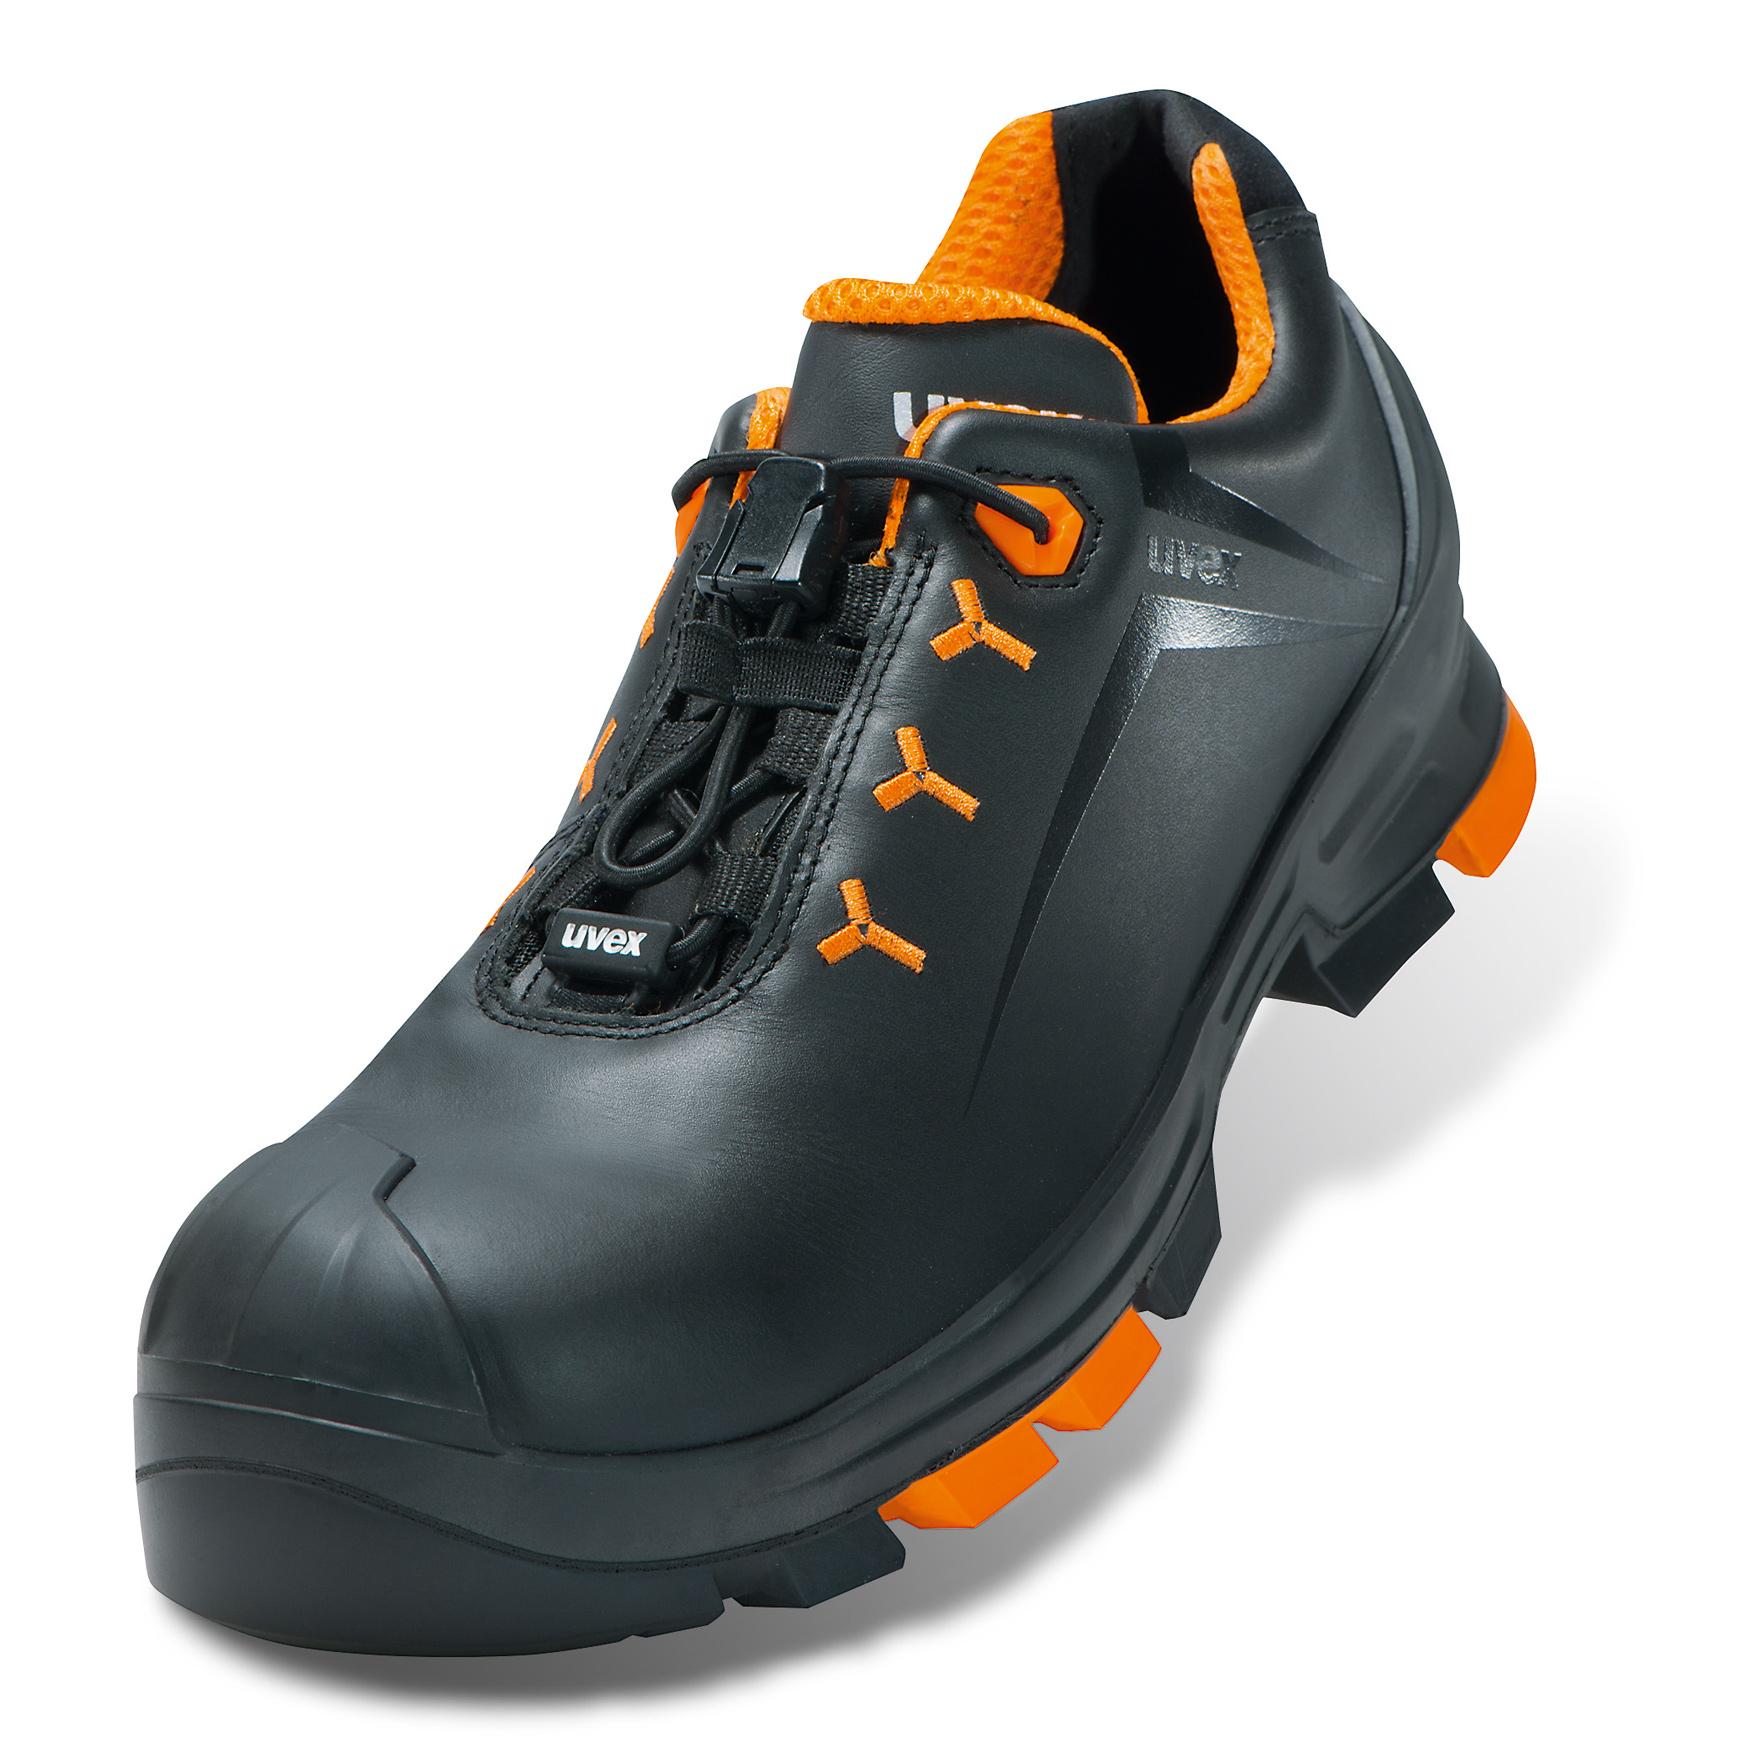 uvex 2 S3 SRC shoe | Safety shoes